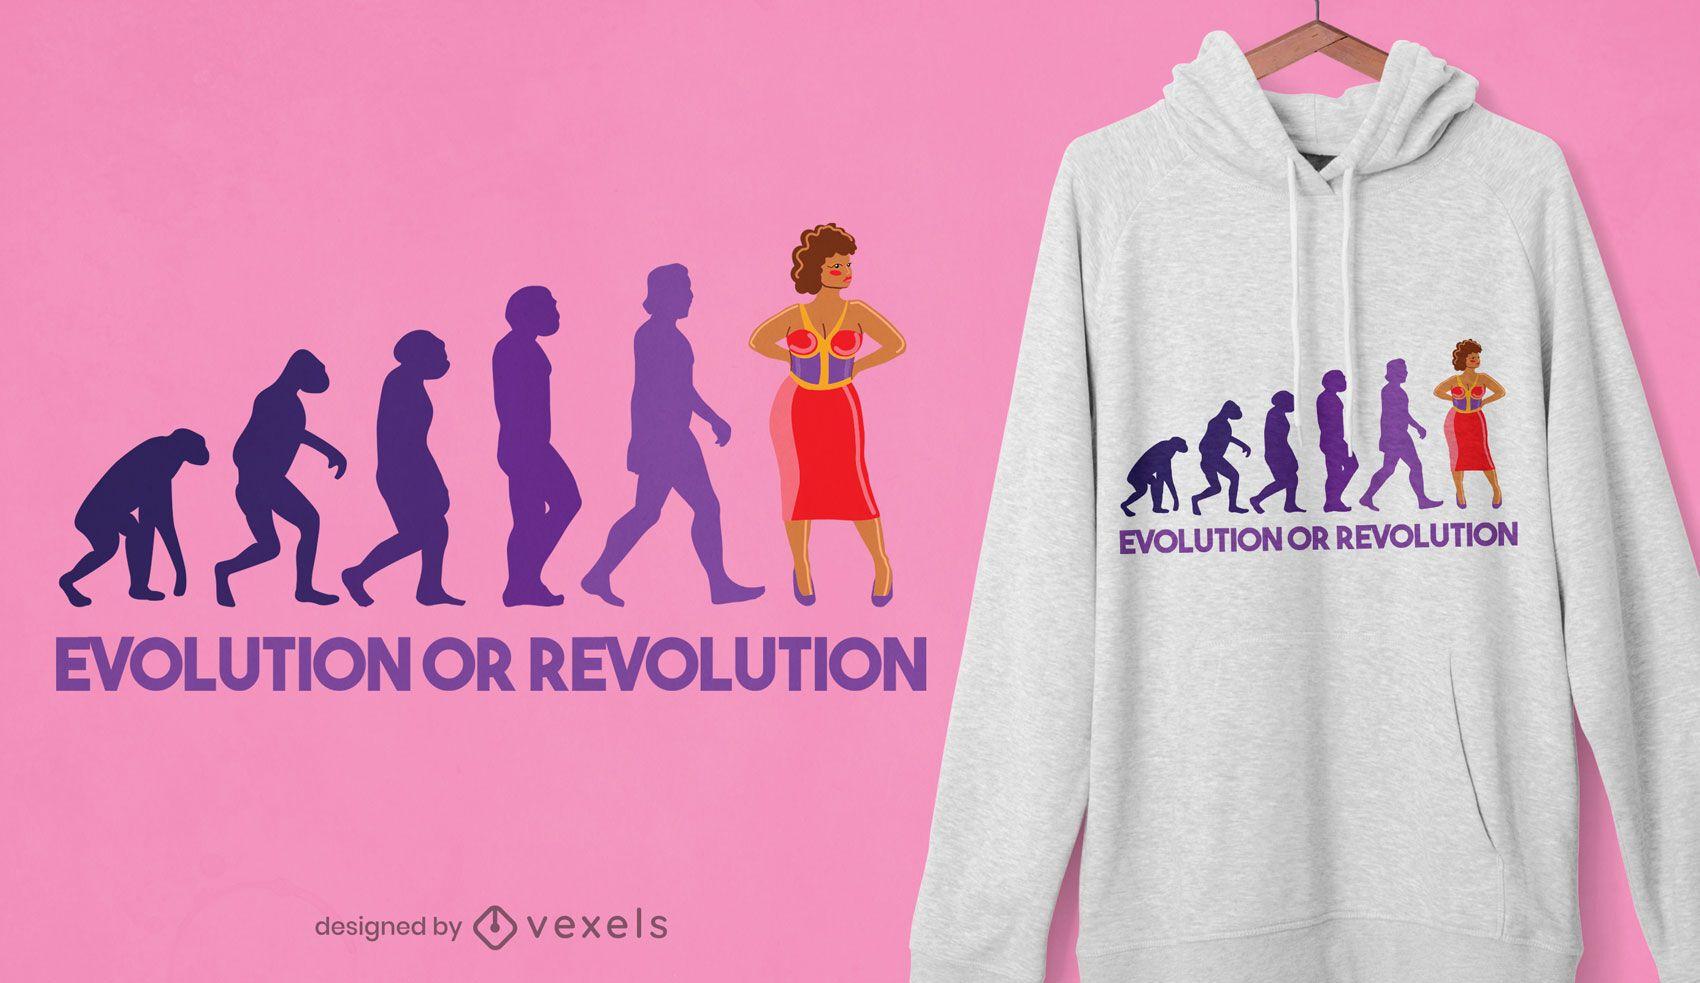 Evolution or revolution t-shirt design